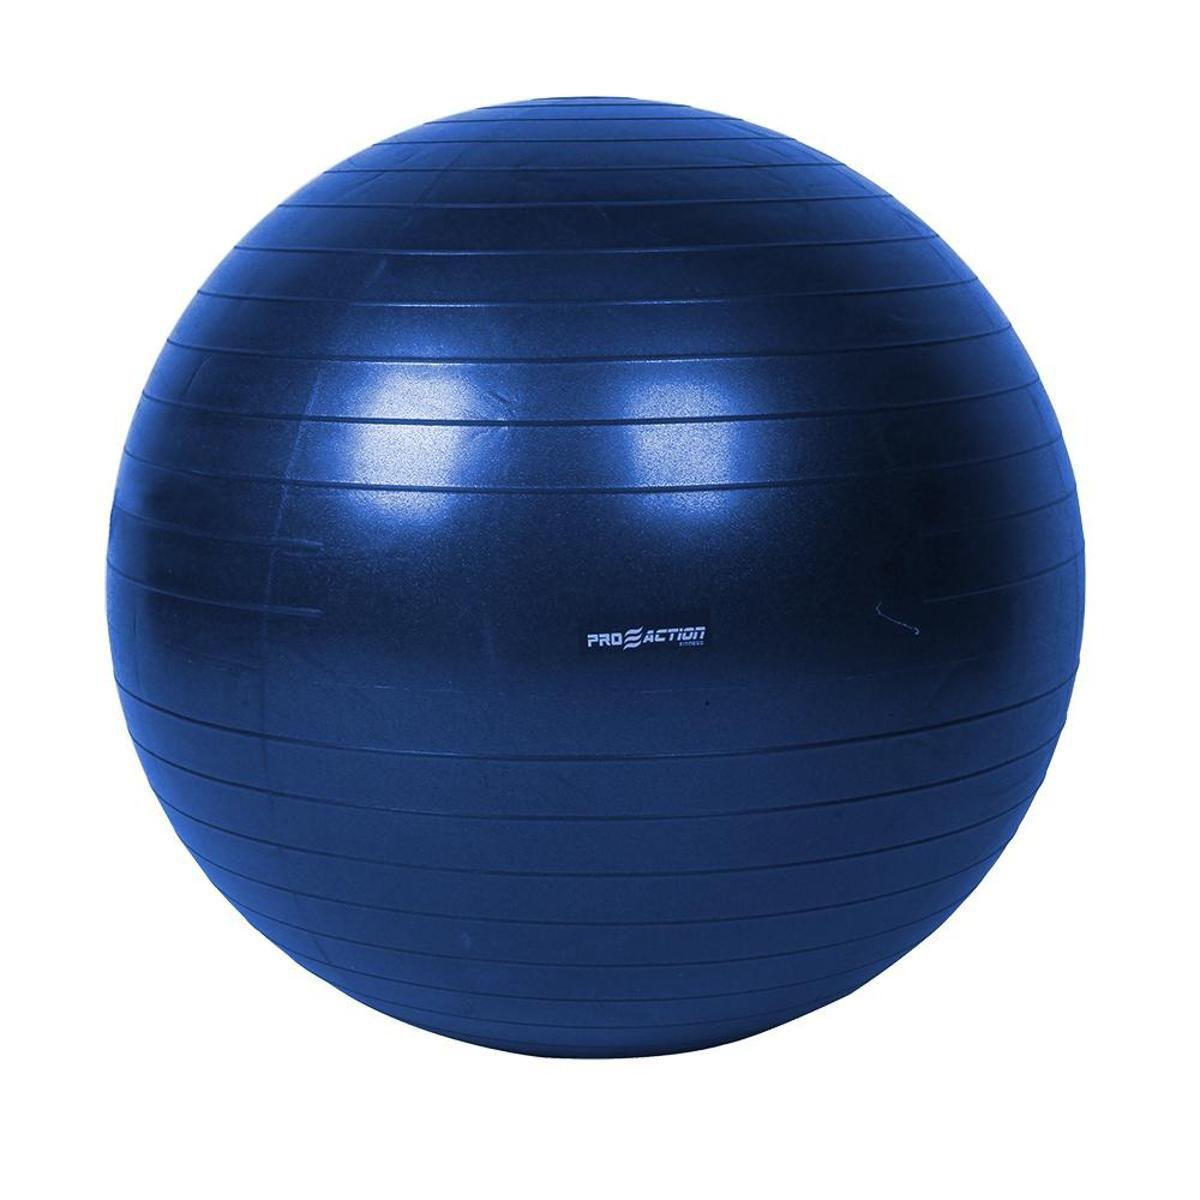 Bola Suiça - Ginástica/Pilates - 85 cm - Pro Action - com bomba